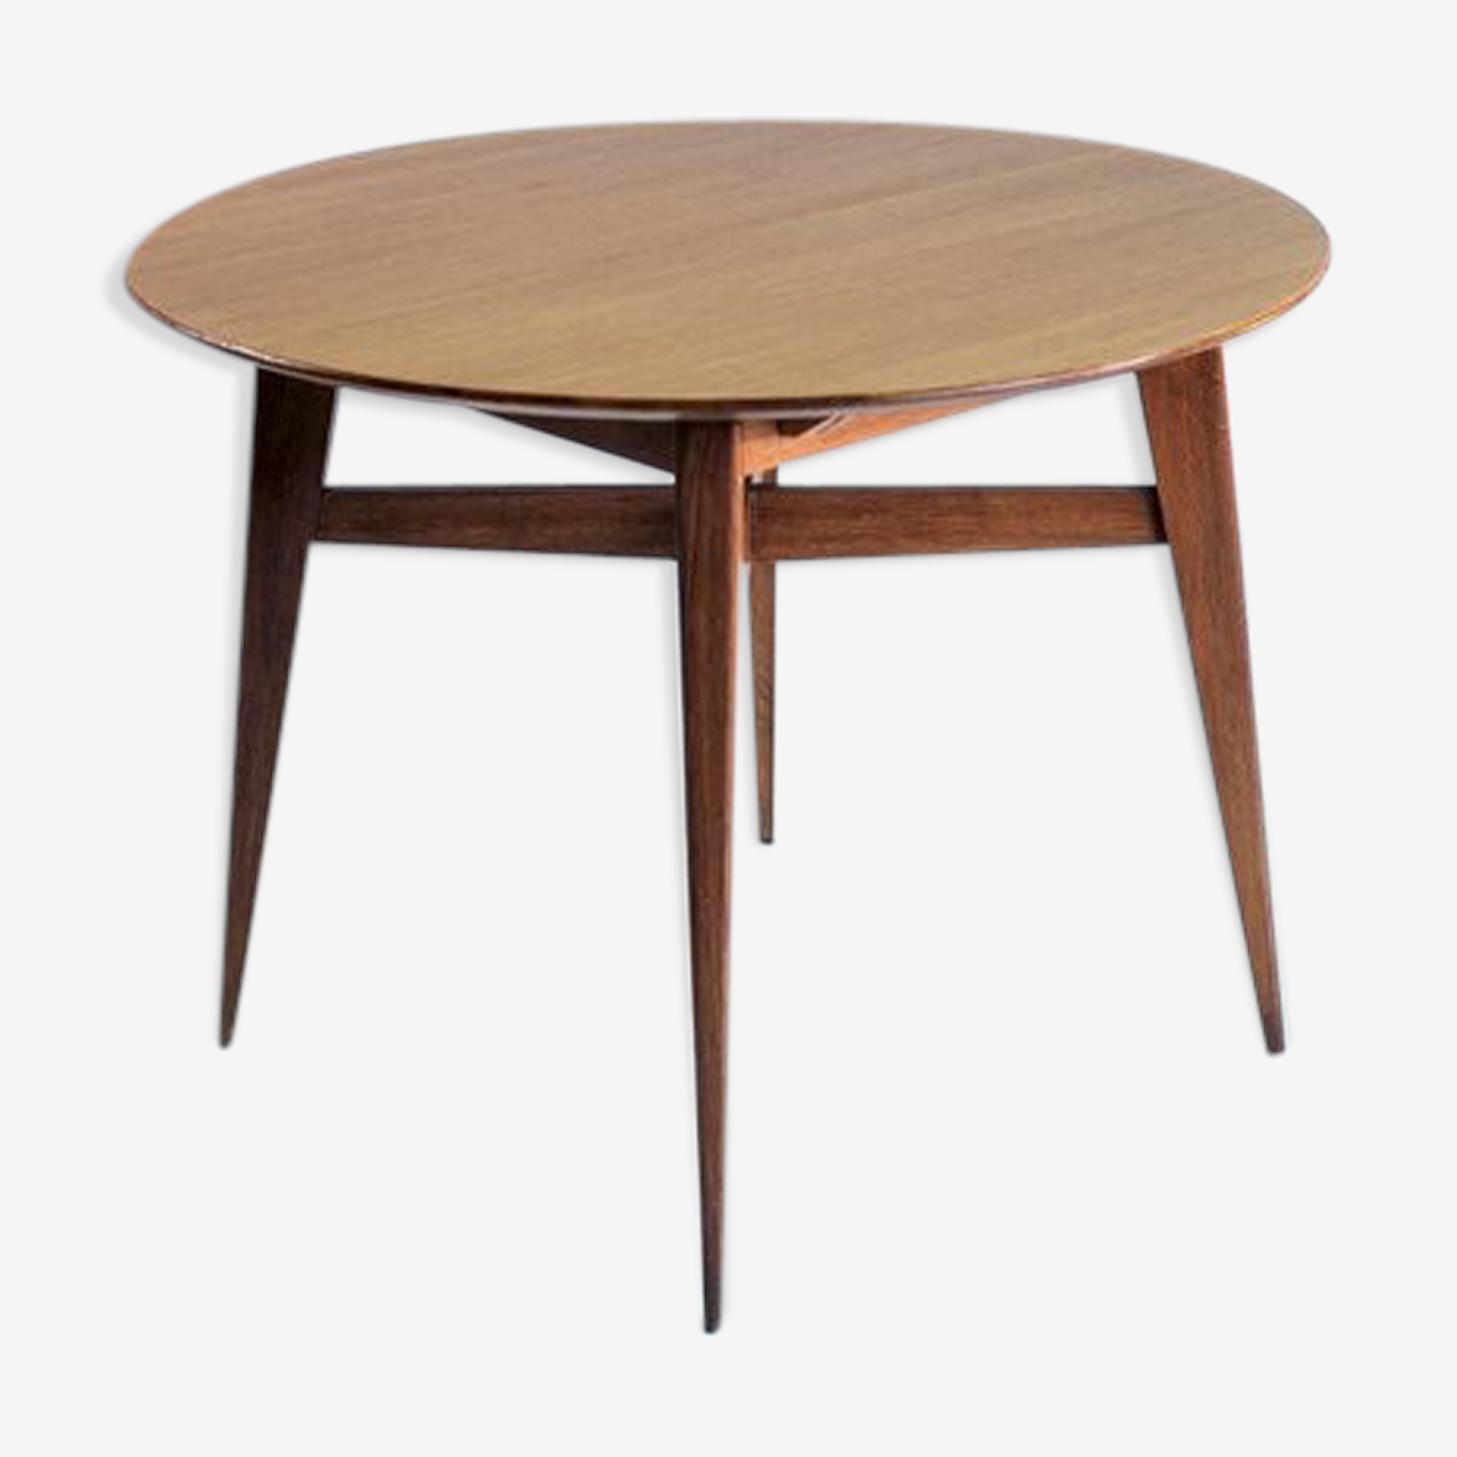 Table en chêne Roger Landault 1950